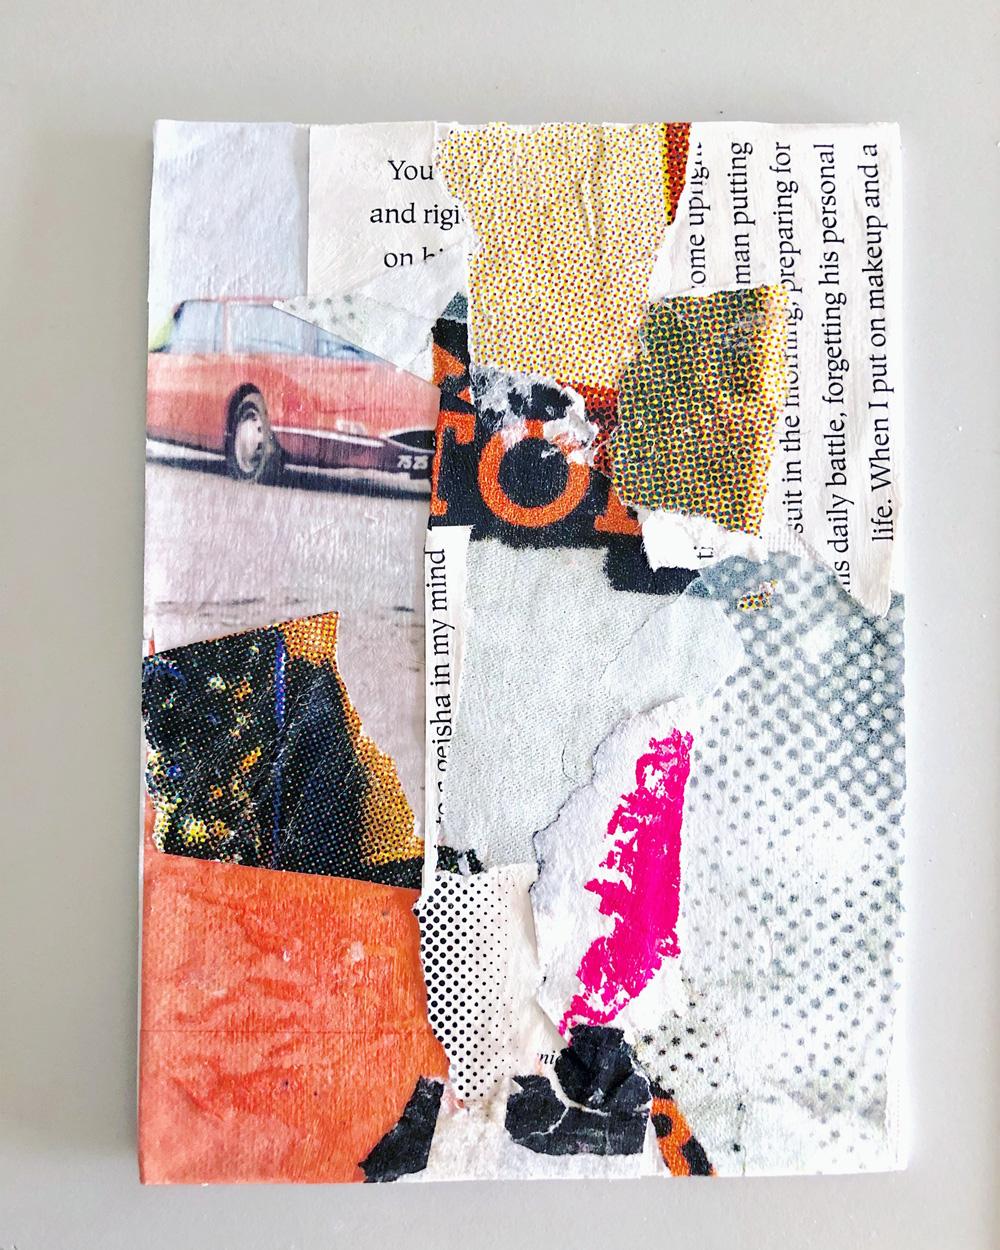 lbourne-collage.jpg